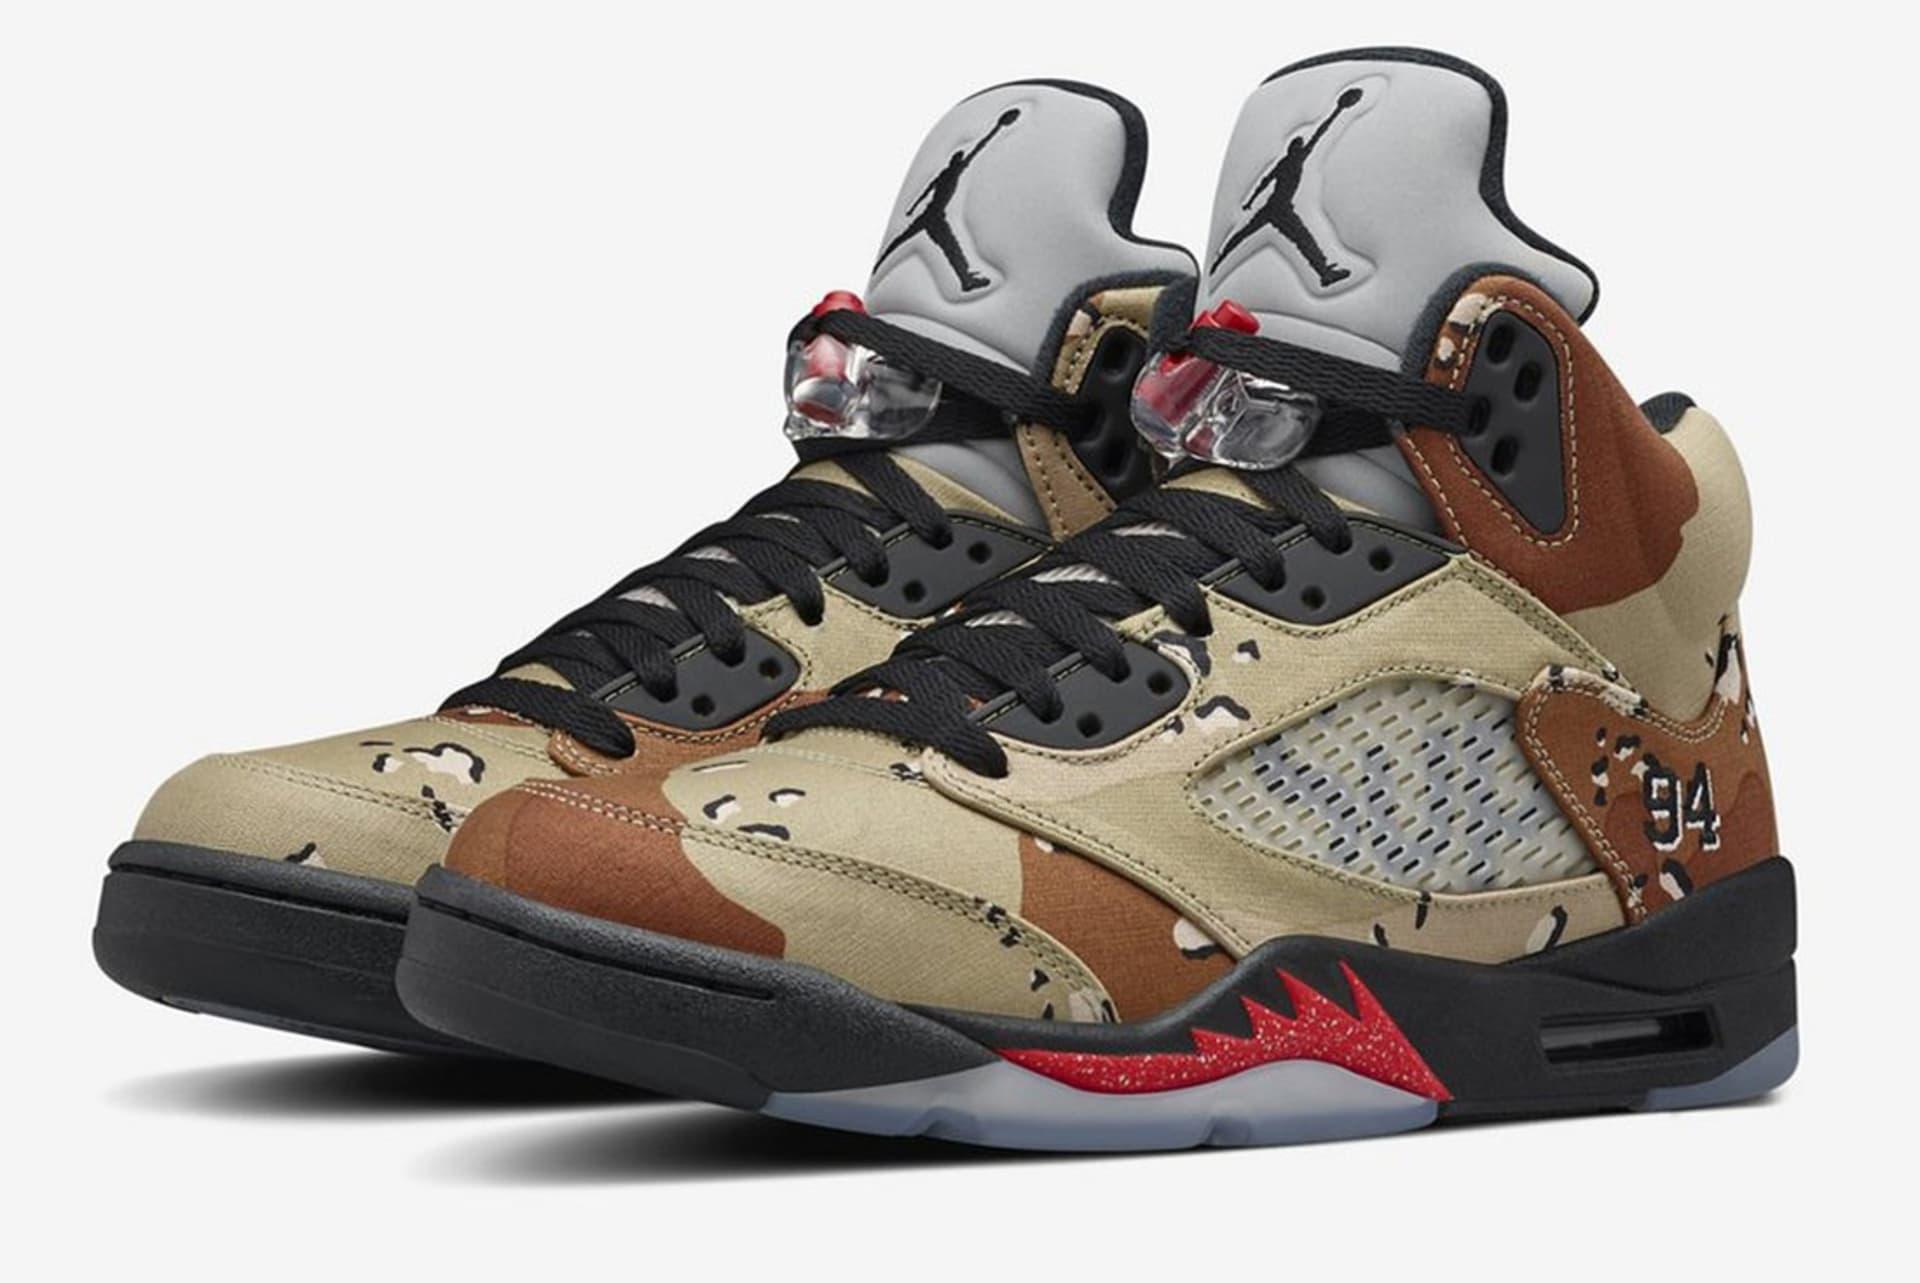 90a5f40d034 The Best Jordans of 2015 | Complex